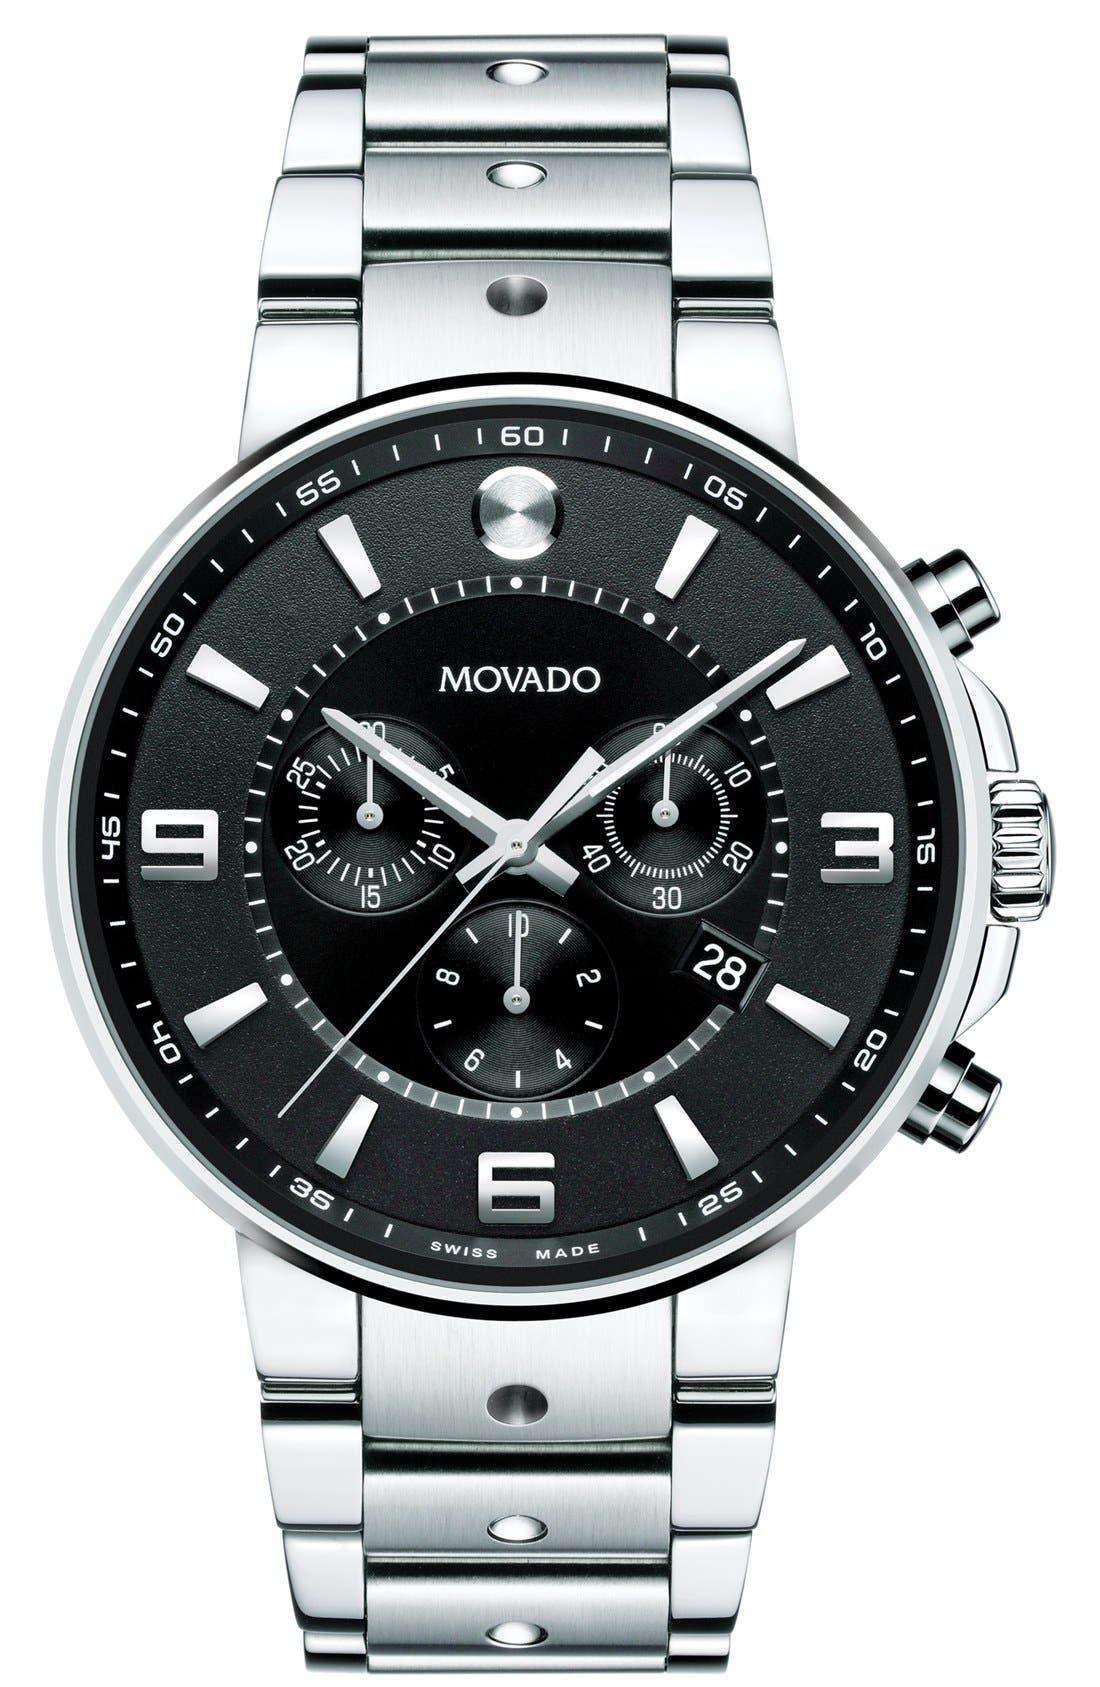 MOVADO S.E. Pilot Chronograph Bracelet Watch, 42mm